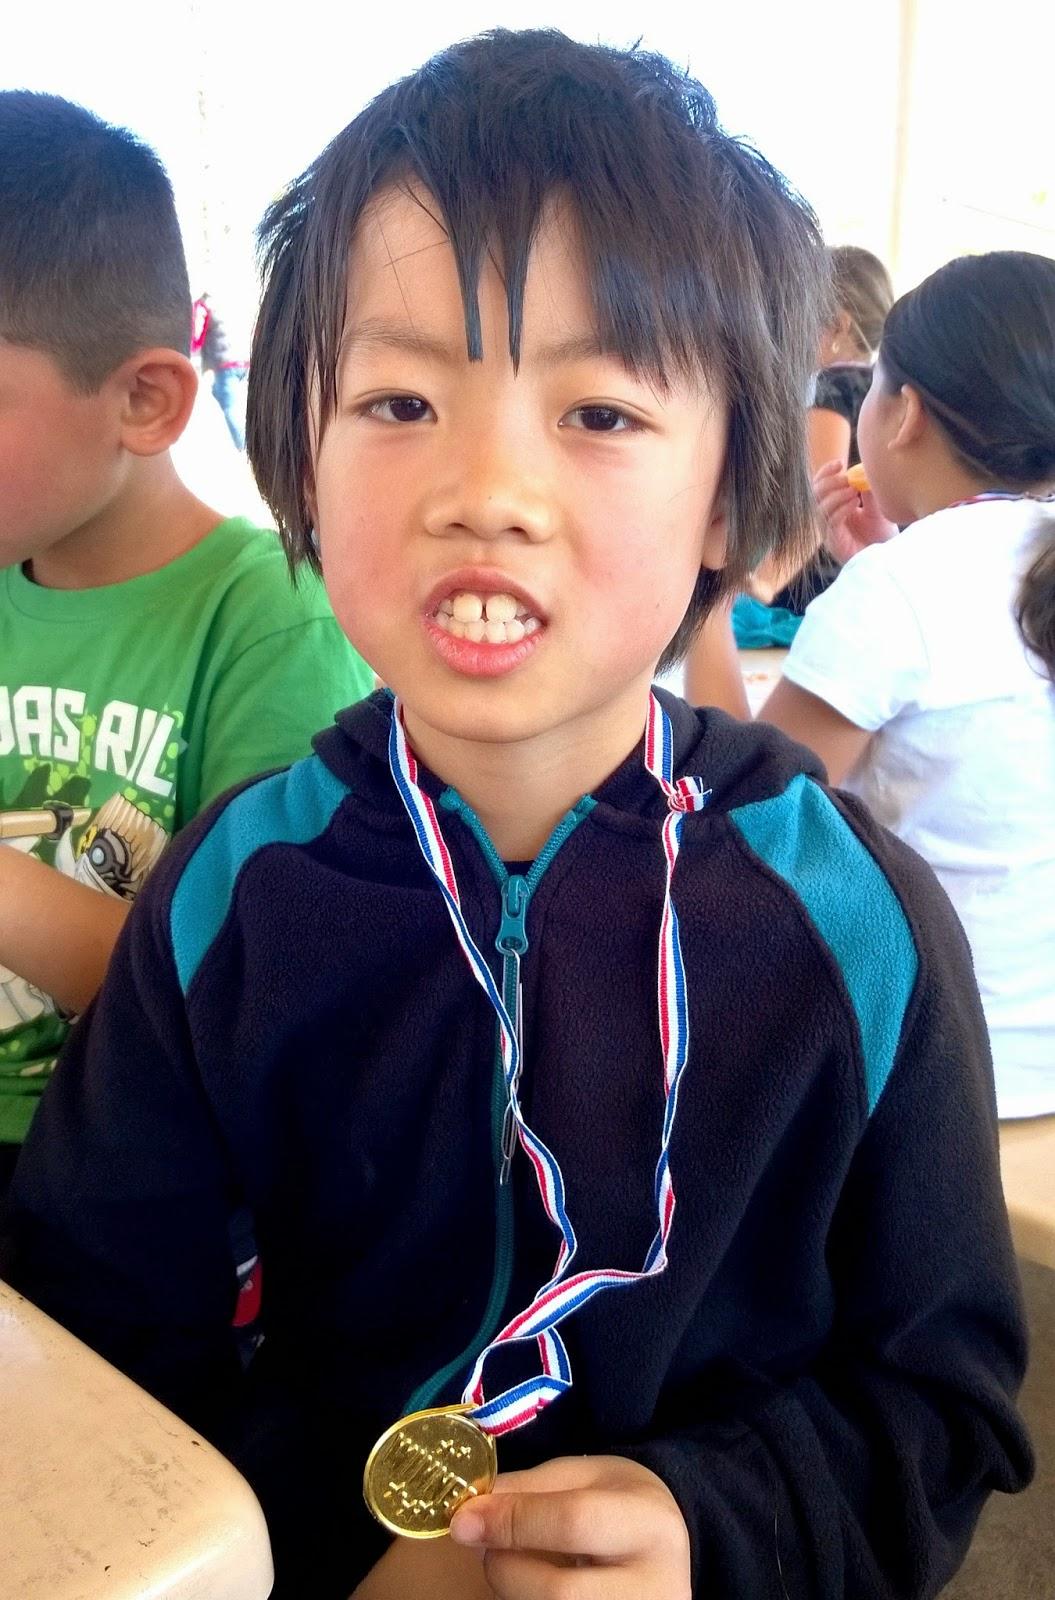 Jog-a-thon school fundraiser